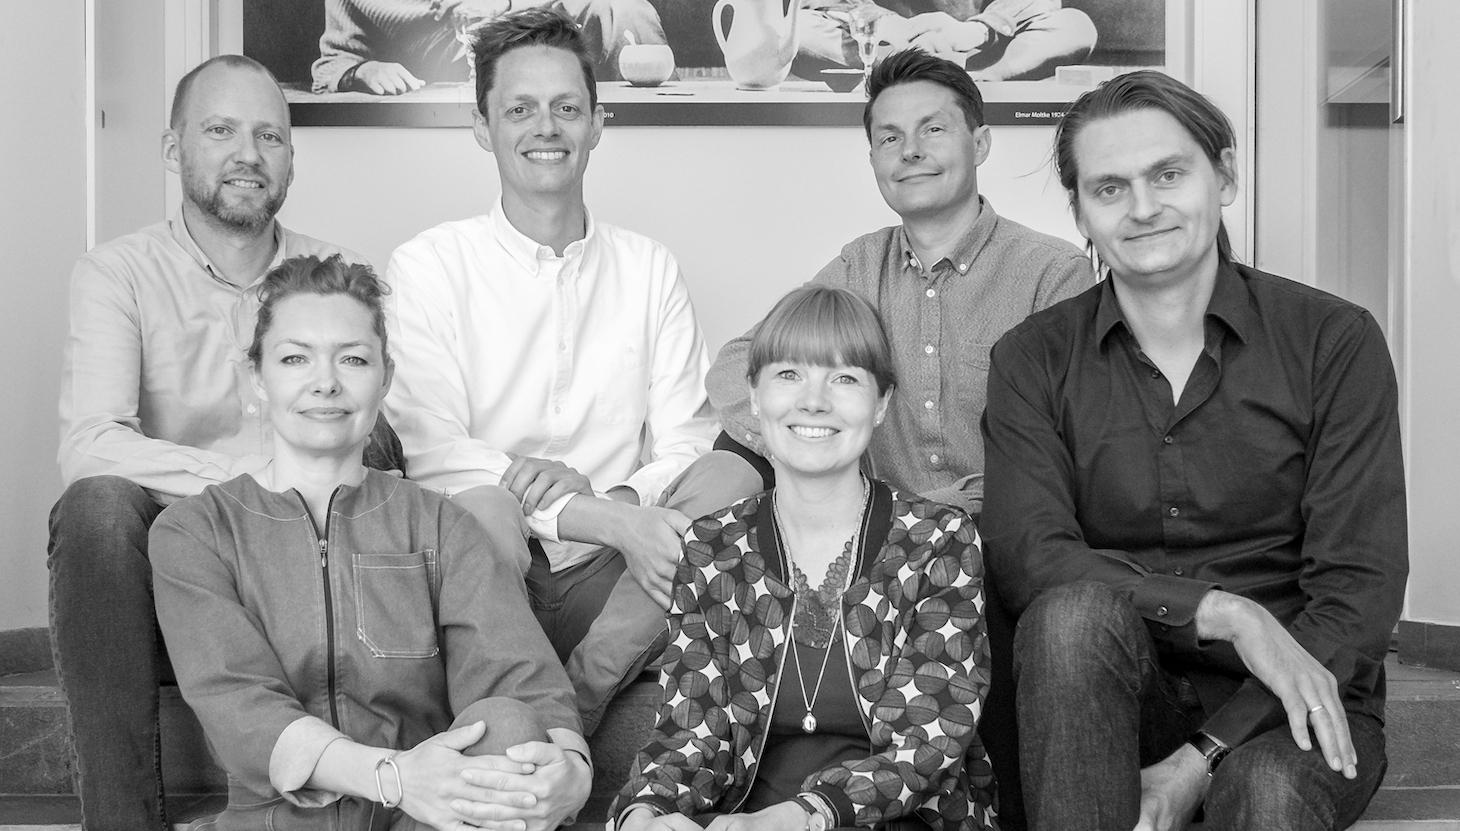 Seks nye FM segmentspecialister